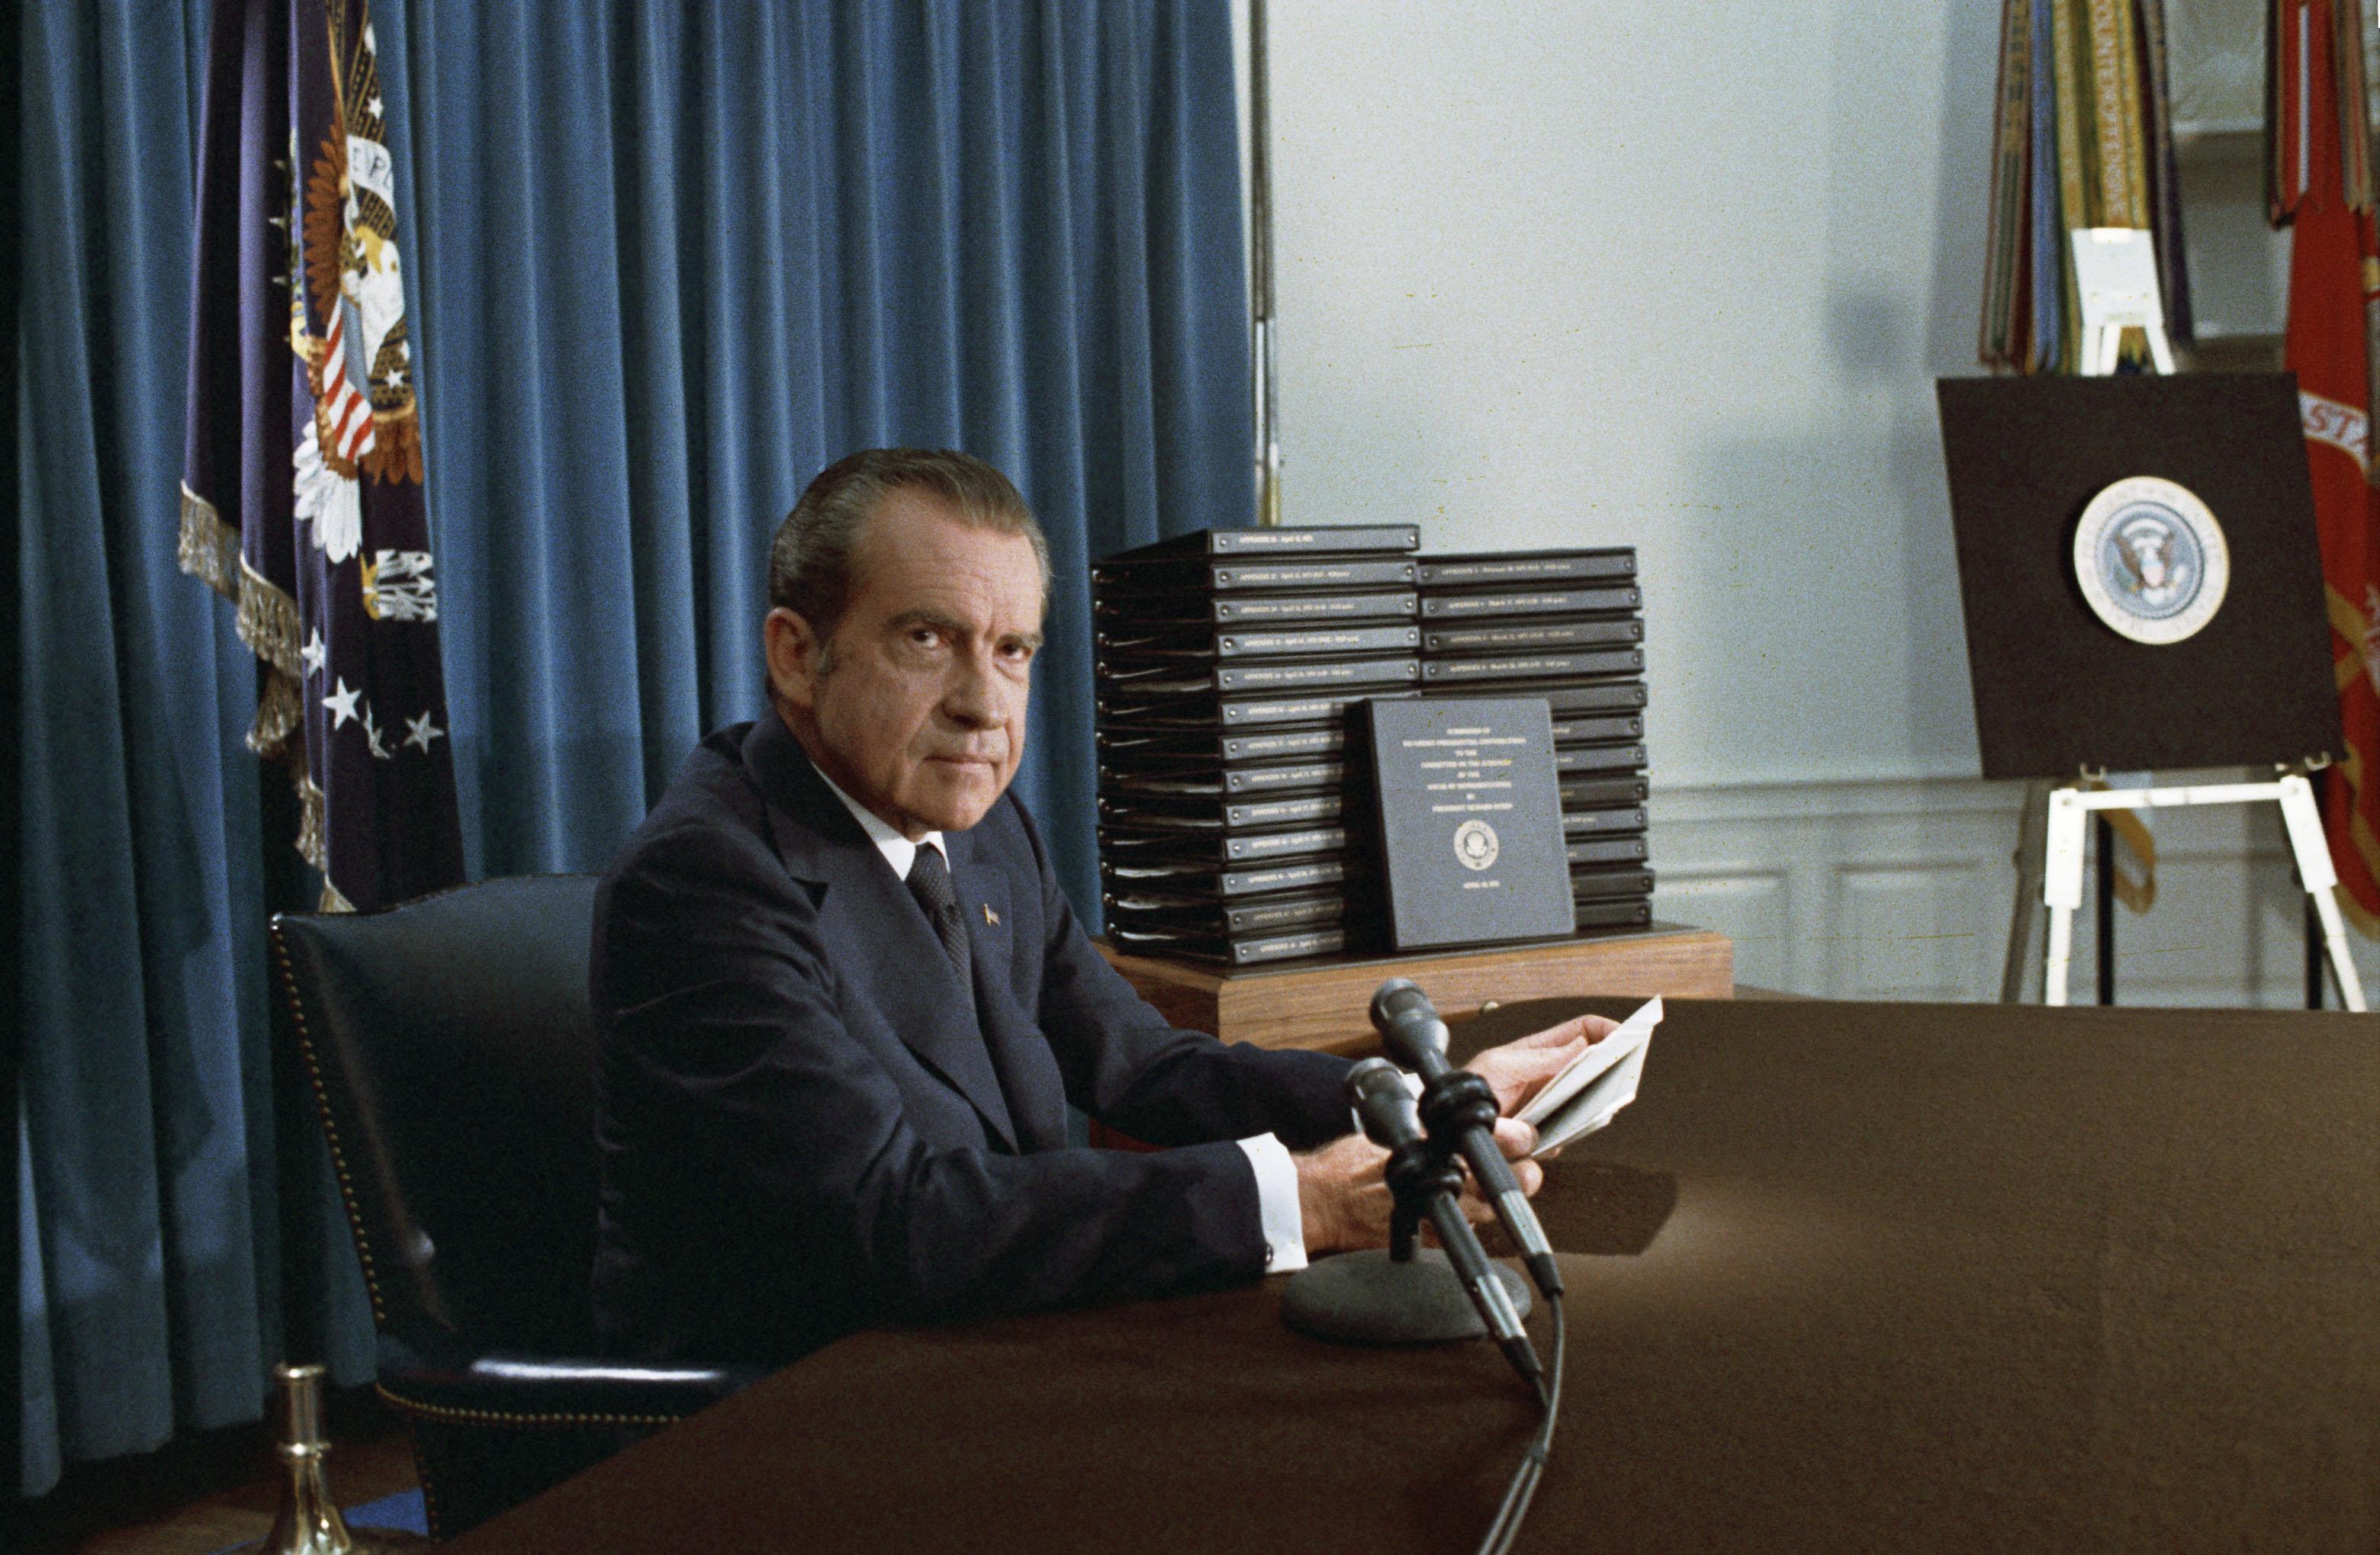 https://i0.wp.com/upload.wikimedia.org/wikipedia/commons/0/04/Nixon_edited_transcripts.jpg